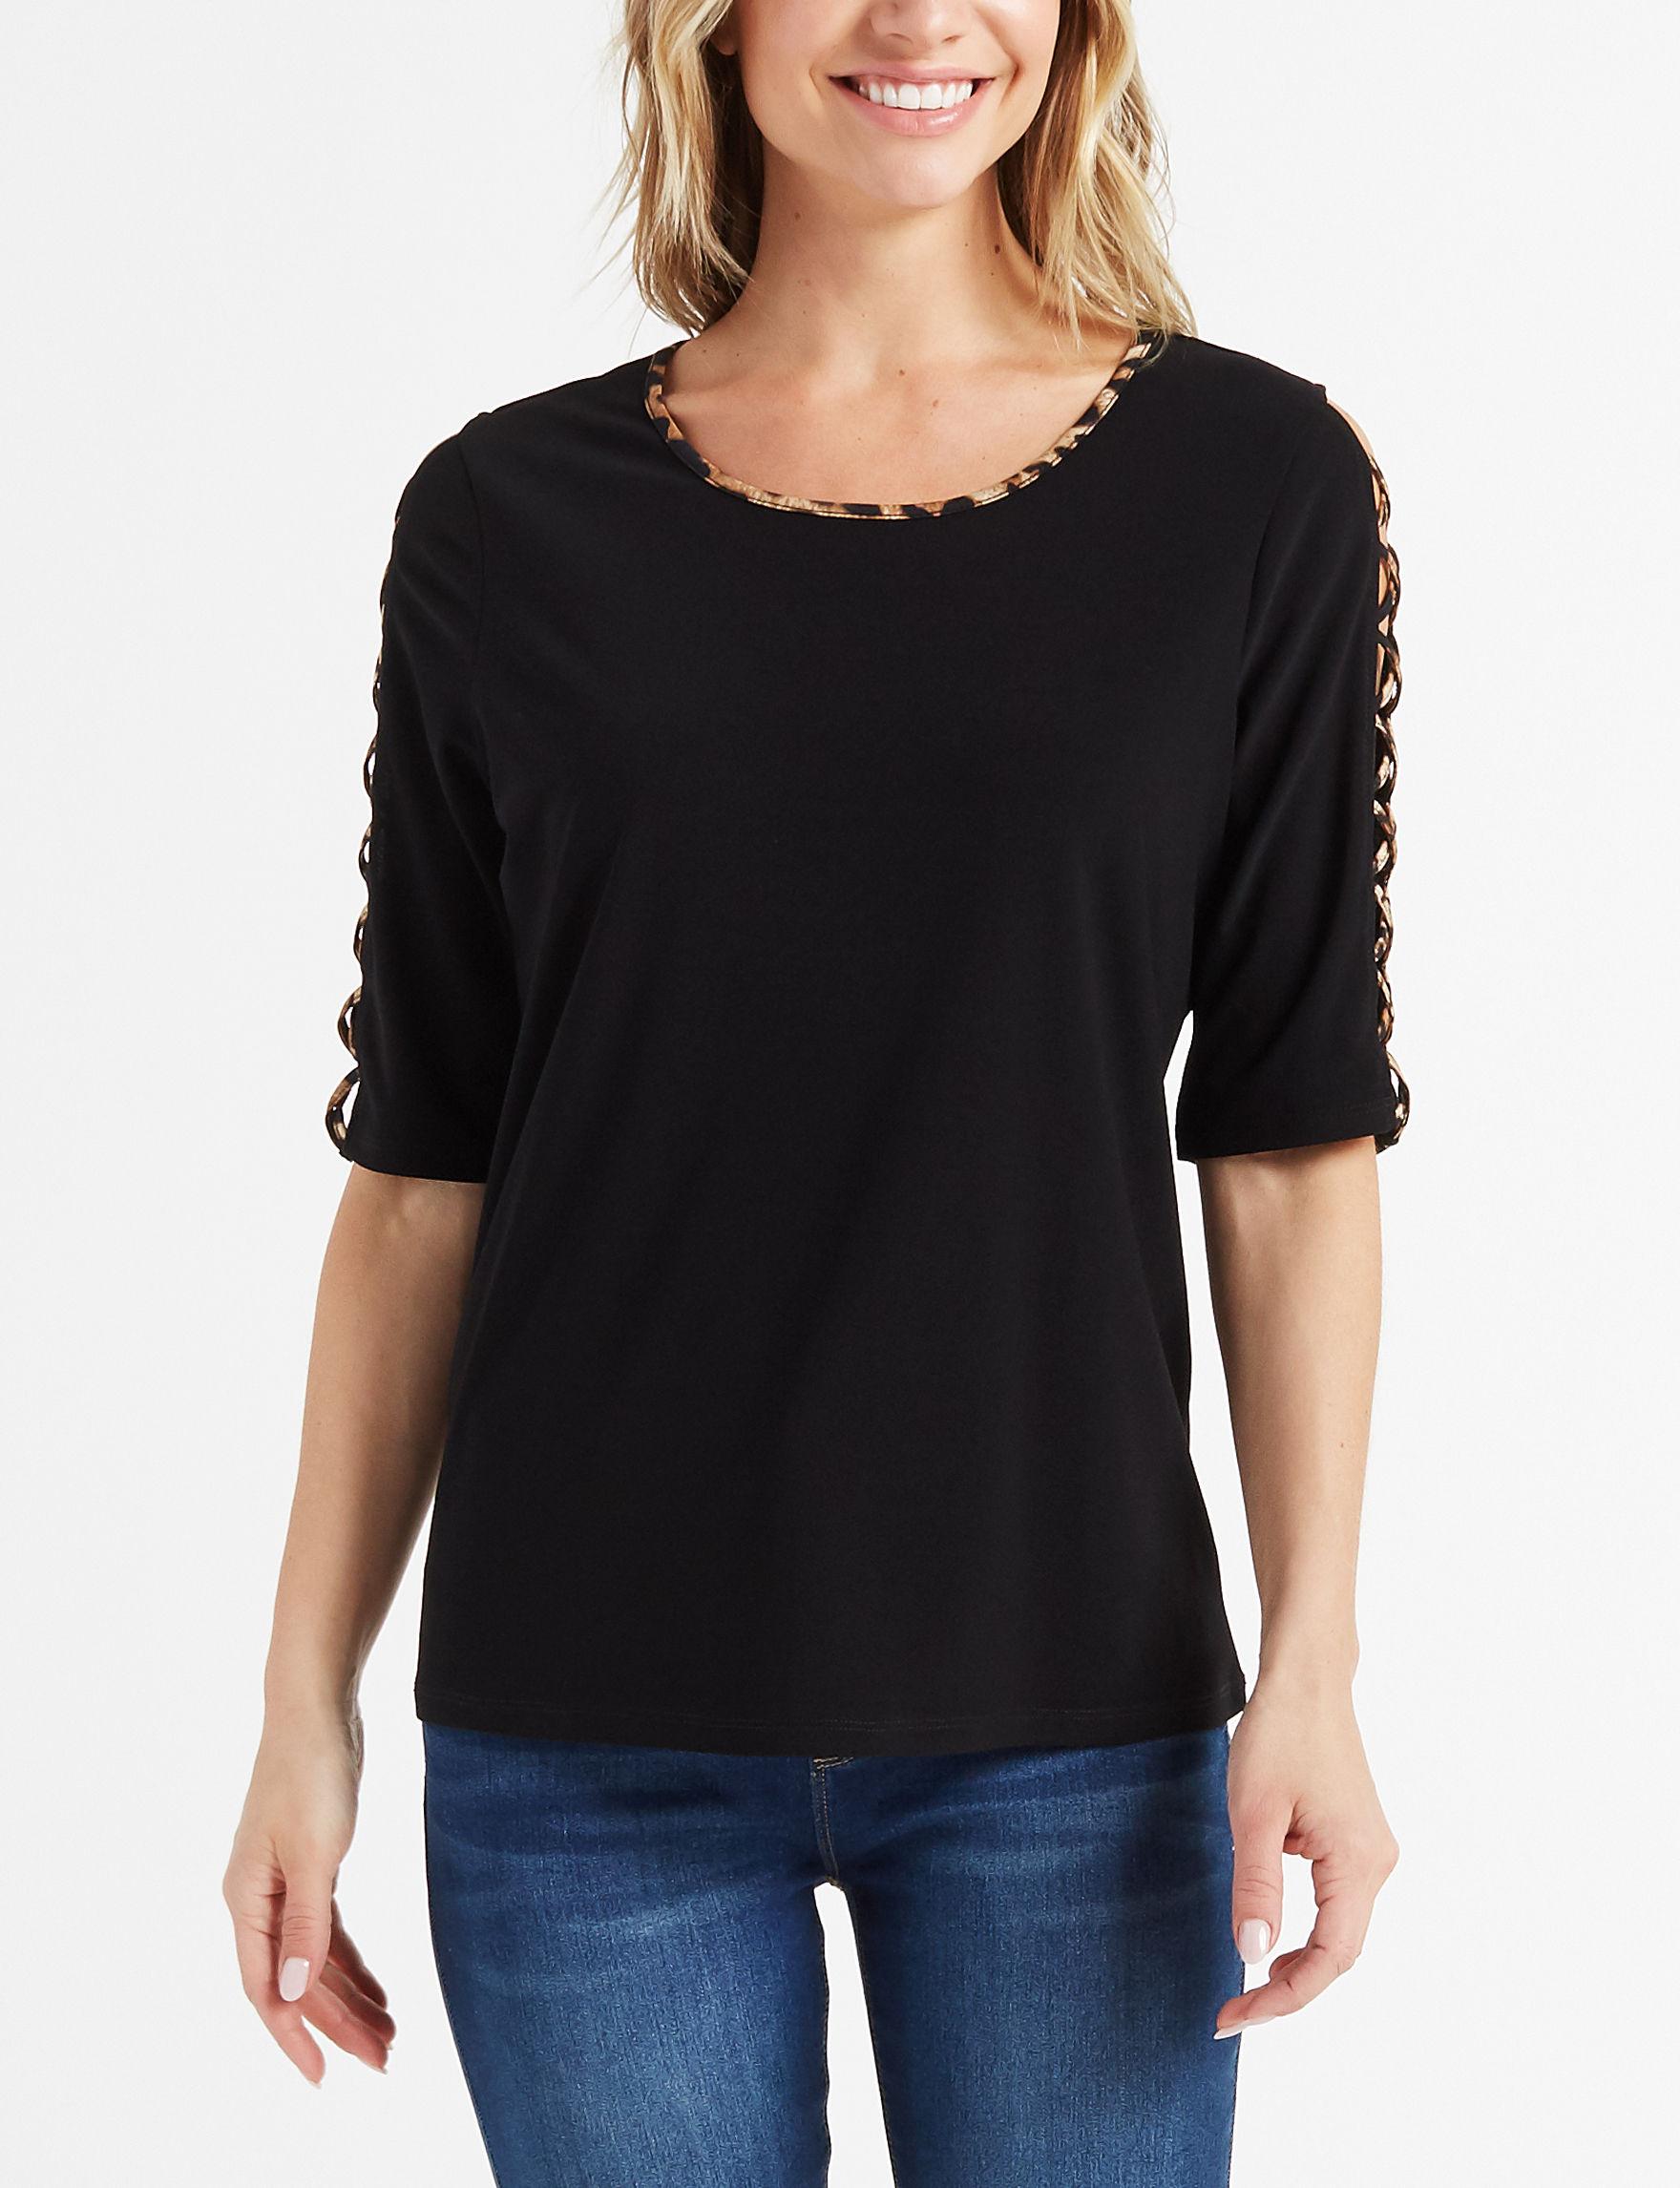 Retrology Black / Cheetah Shirts & Blouses